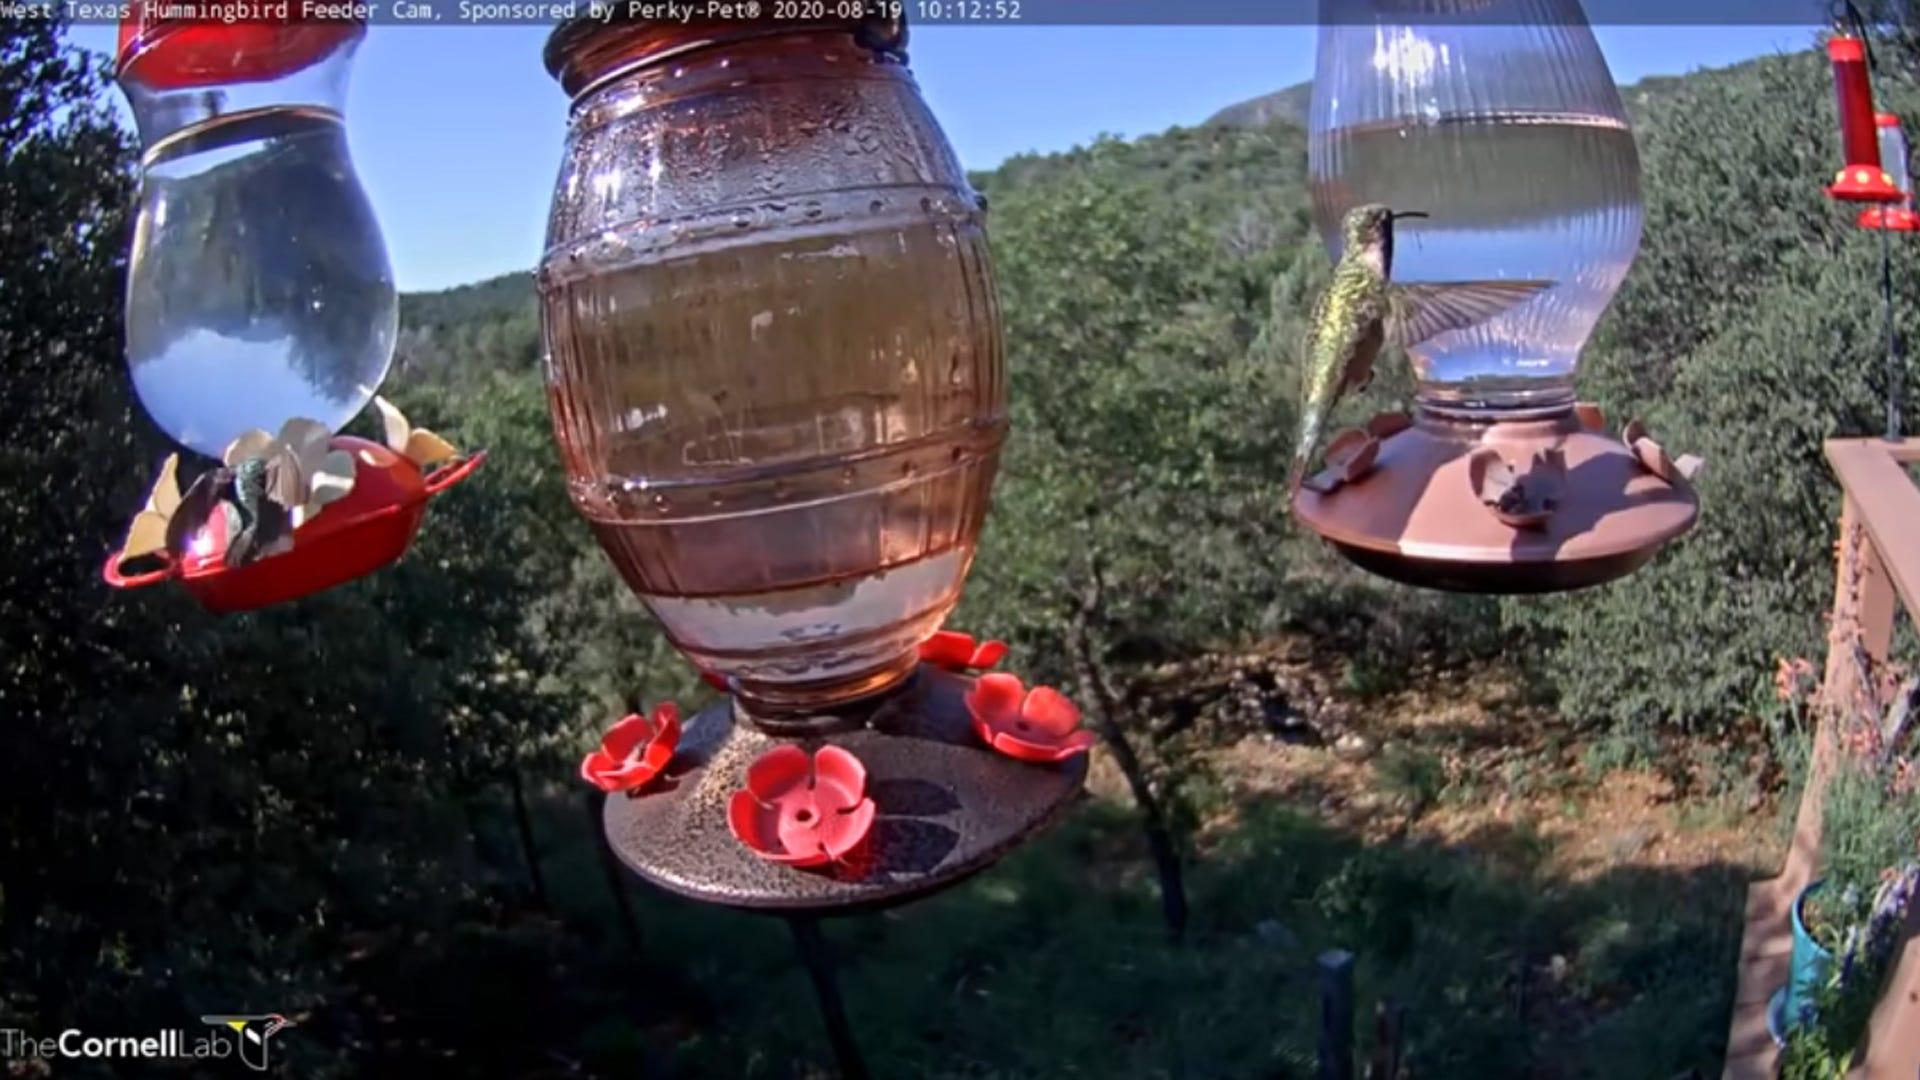 Check Out the Perky-Pet® Hummingbird Feeder Cam